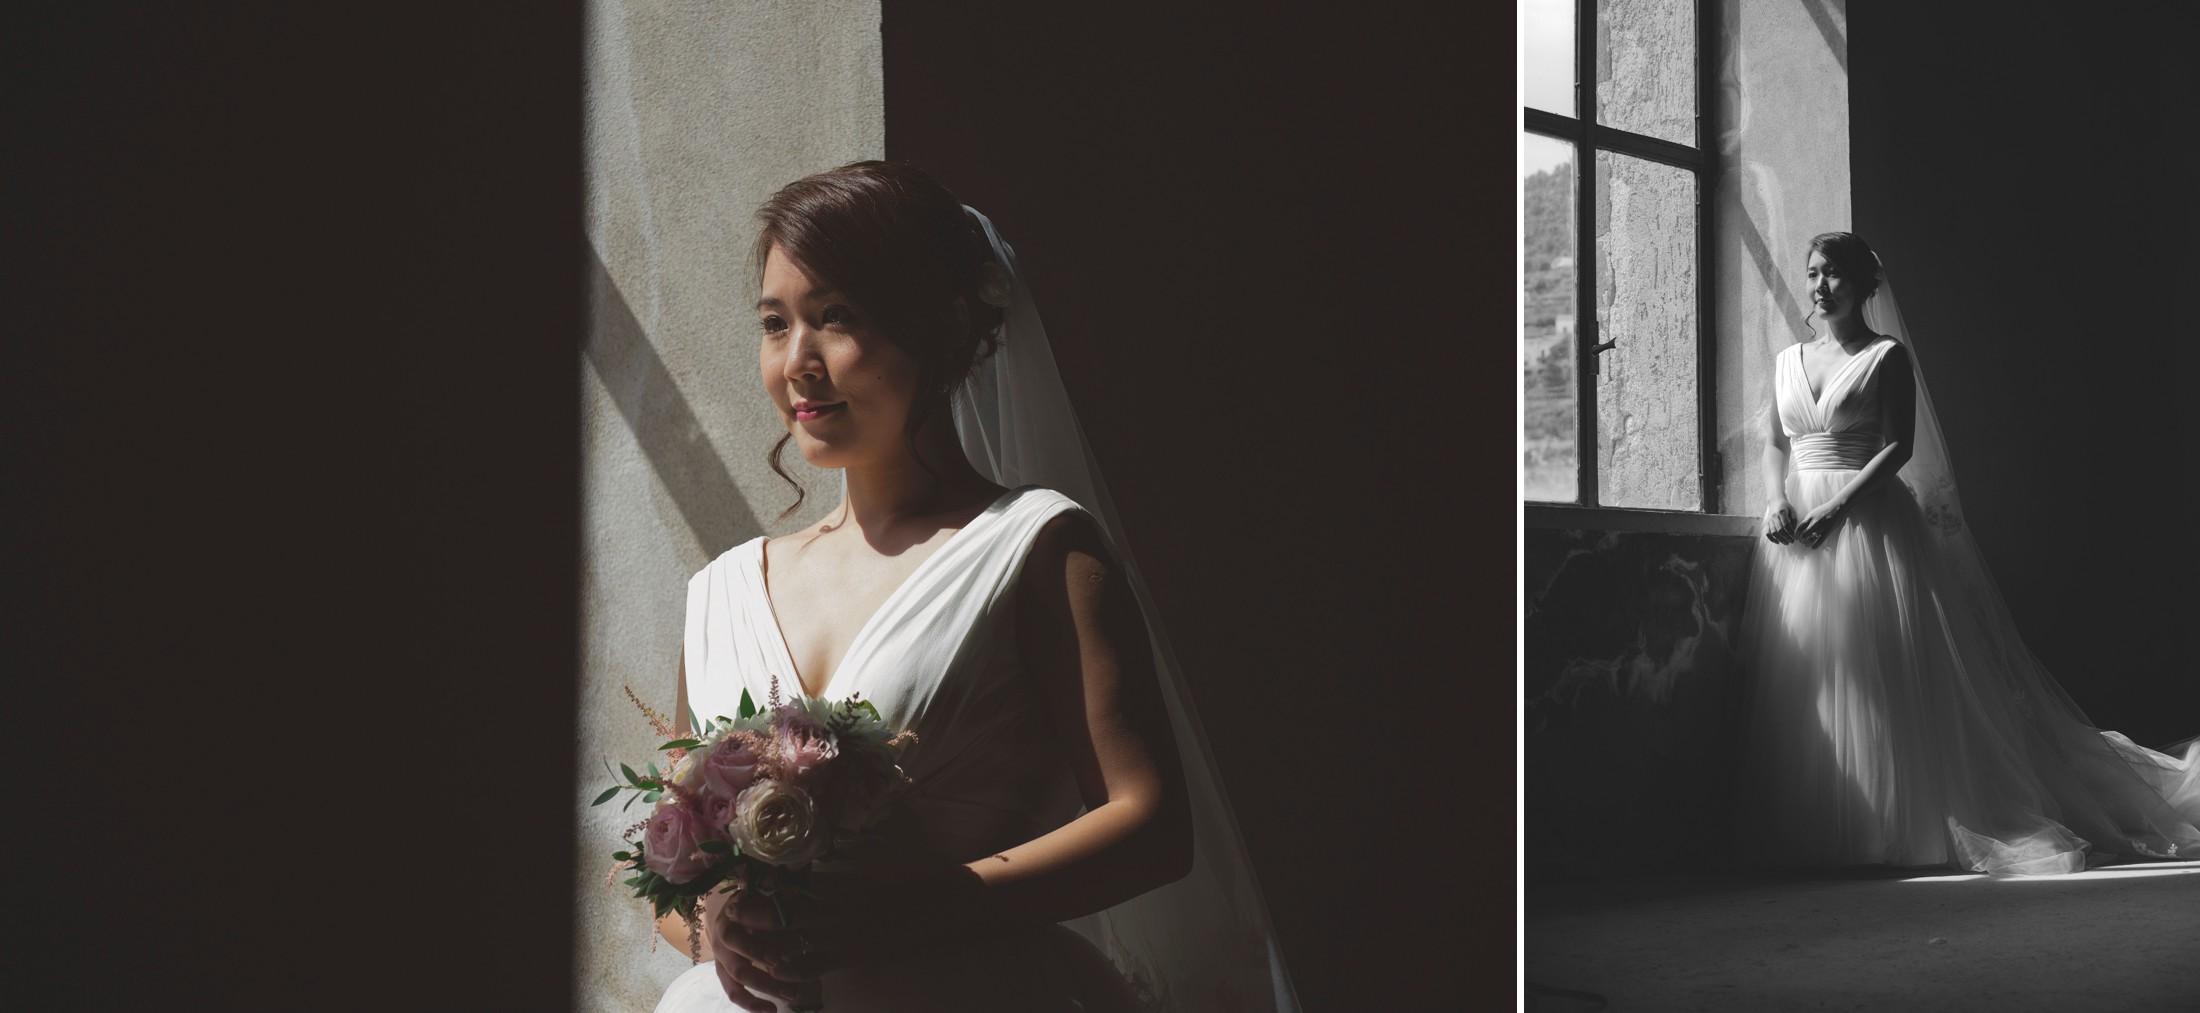 wedding on the amalfi coast collage portraits of the bride